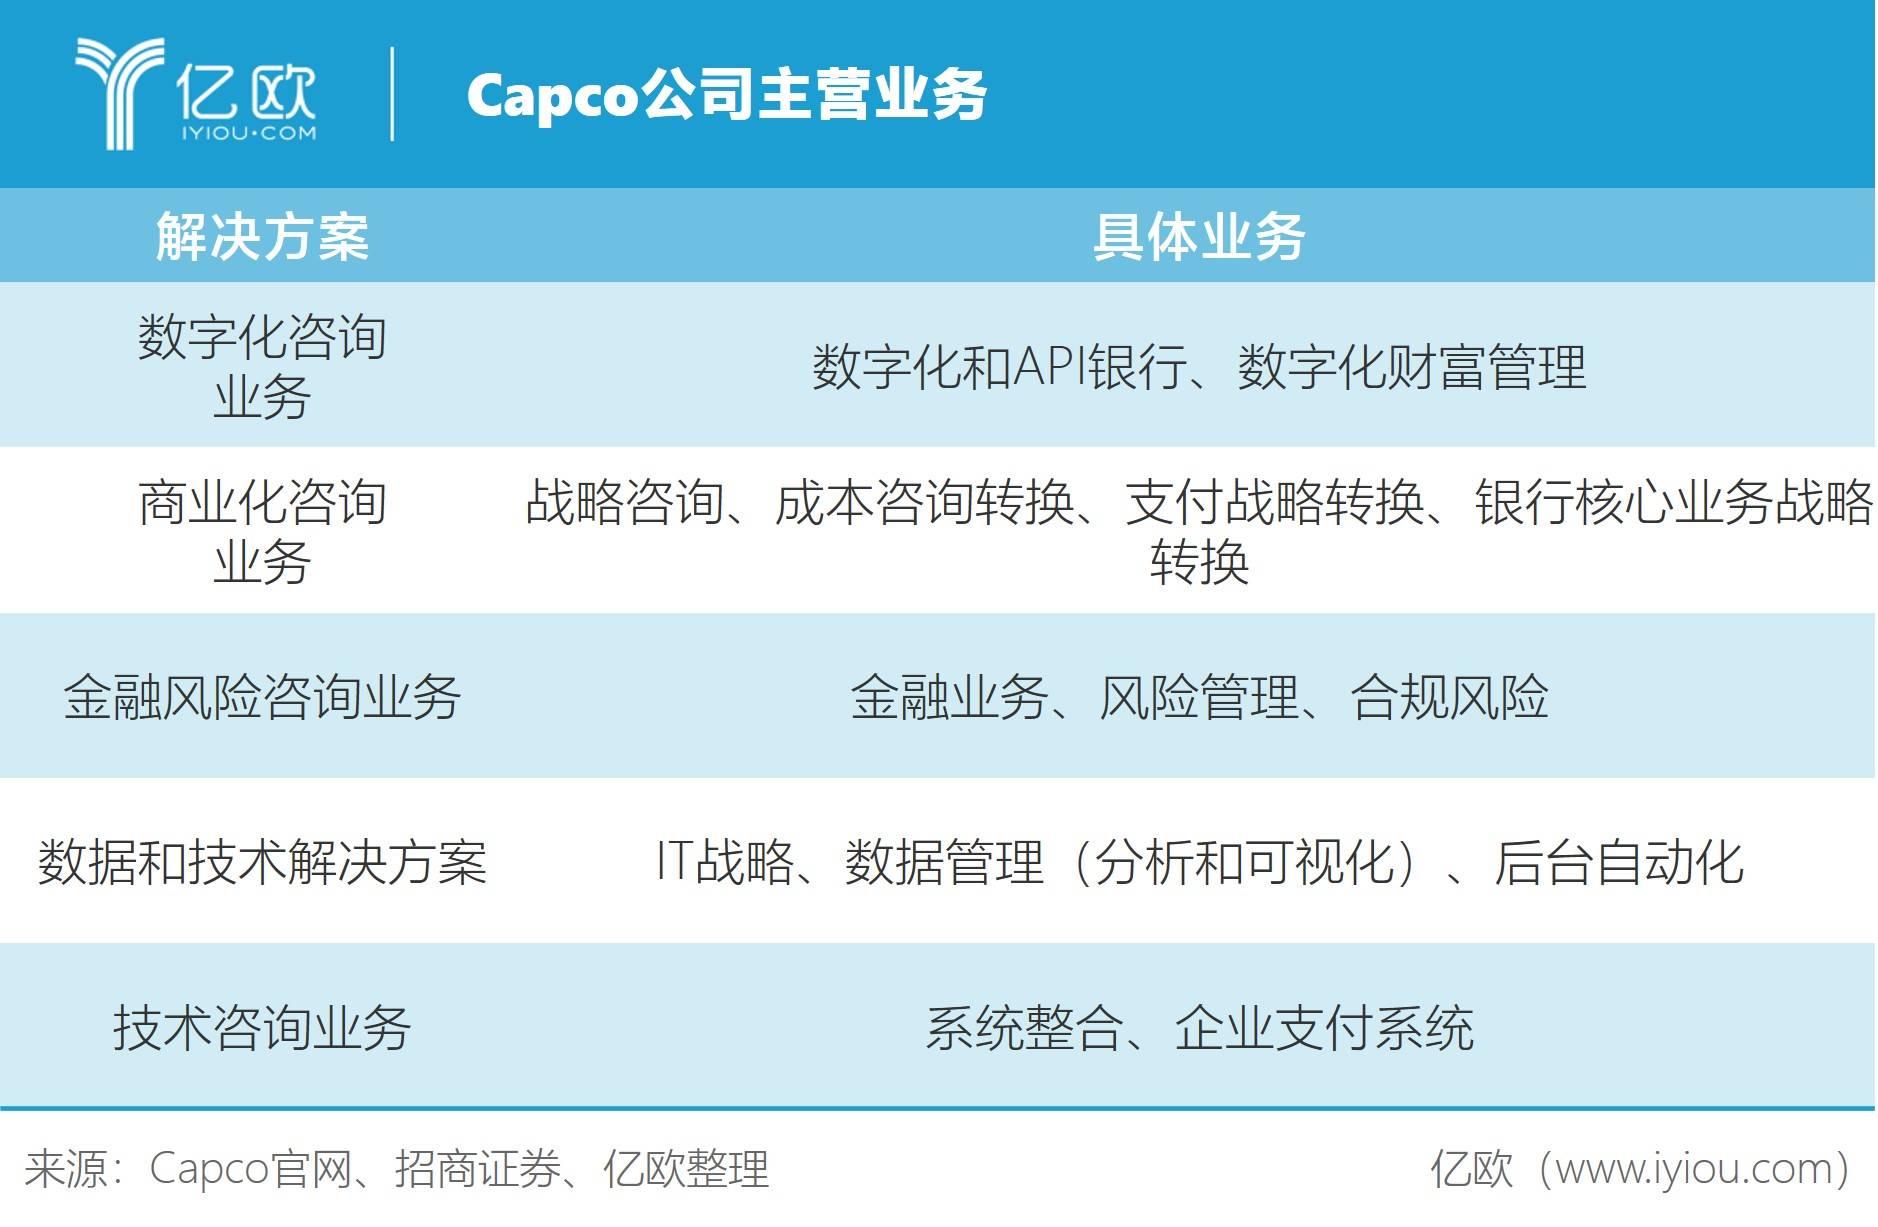 Capco公司主营业务